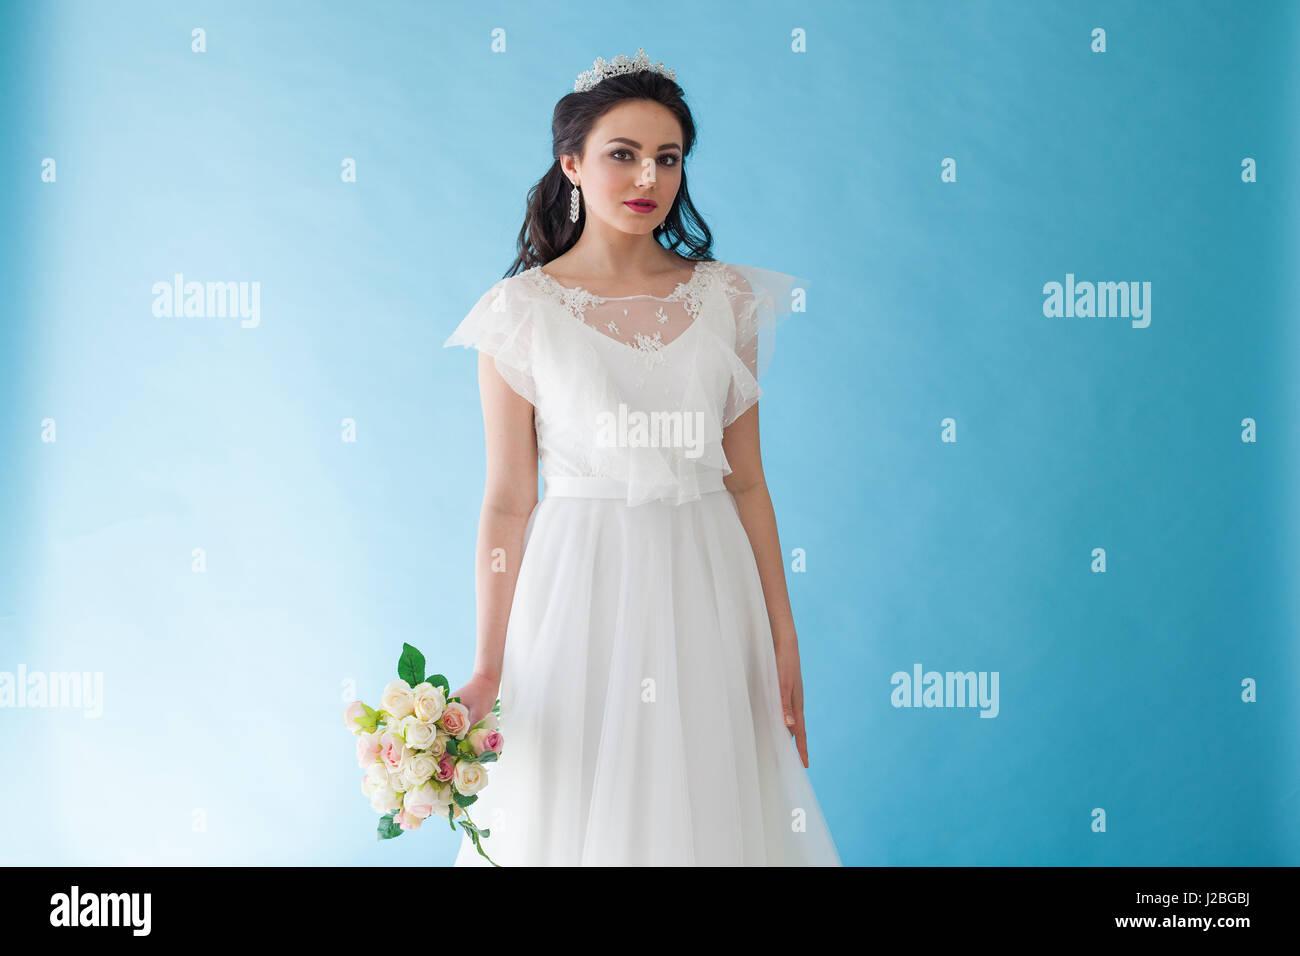 Princess Bride Stock Photos & Princess Bride Stock Images - Alamy